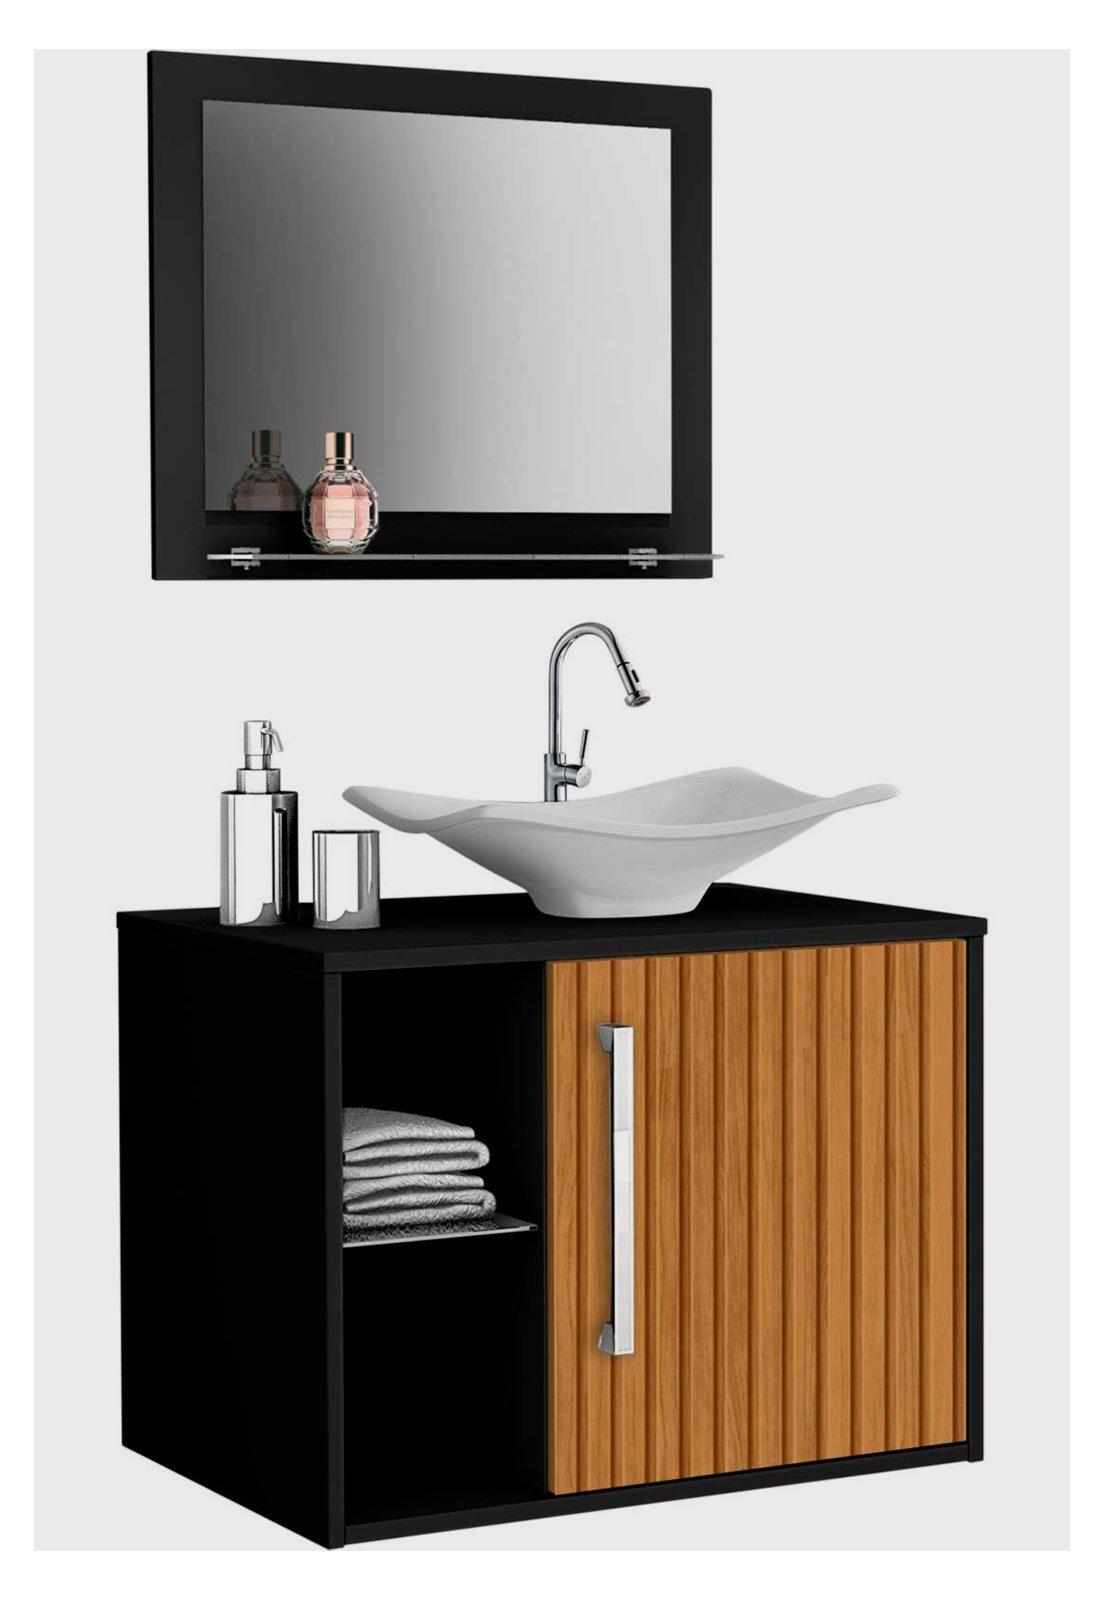 Gabinete Banheiro Baden C Cuba E Espelheira Preto Moveis Bechara Compre Agora Dafiti Brasil